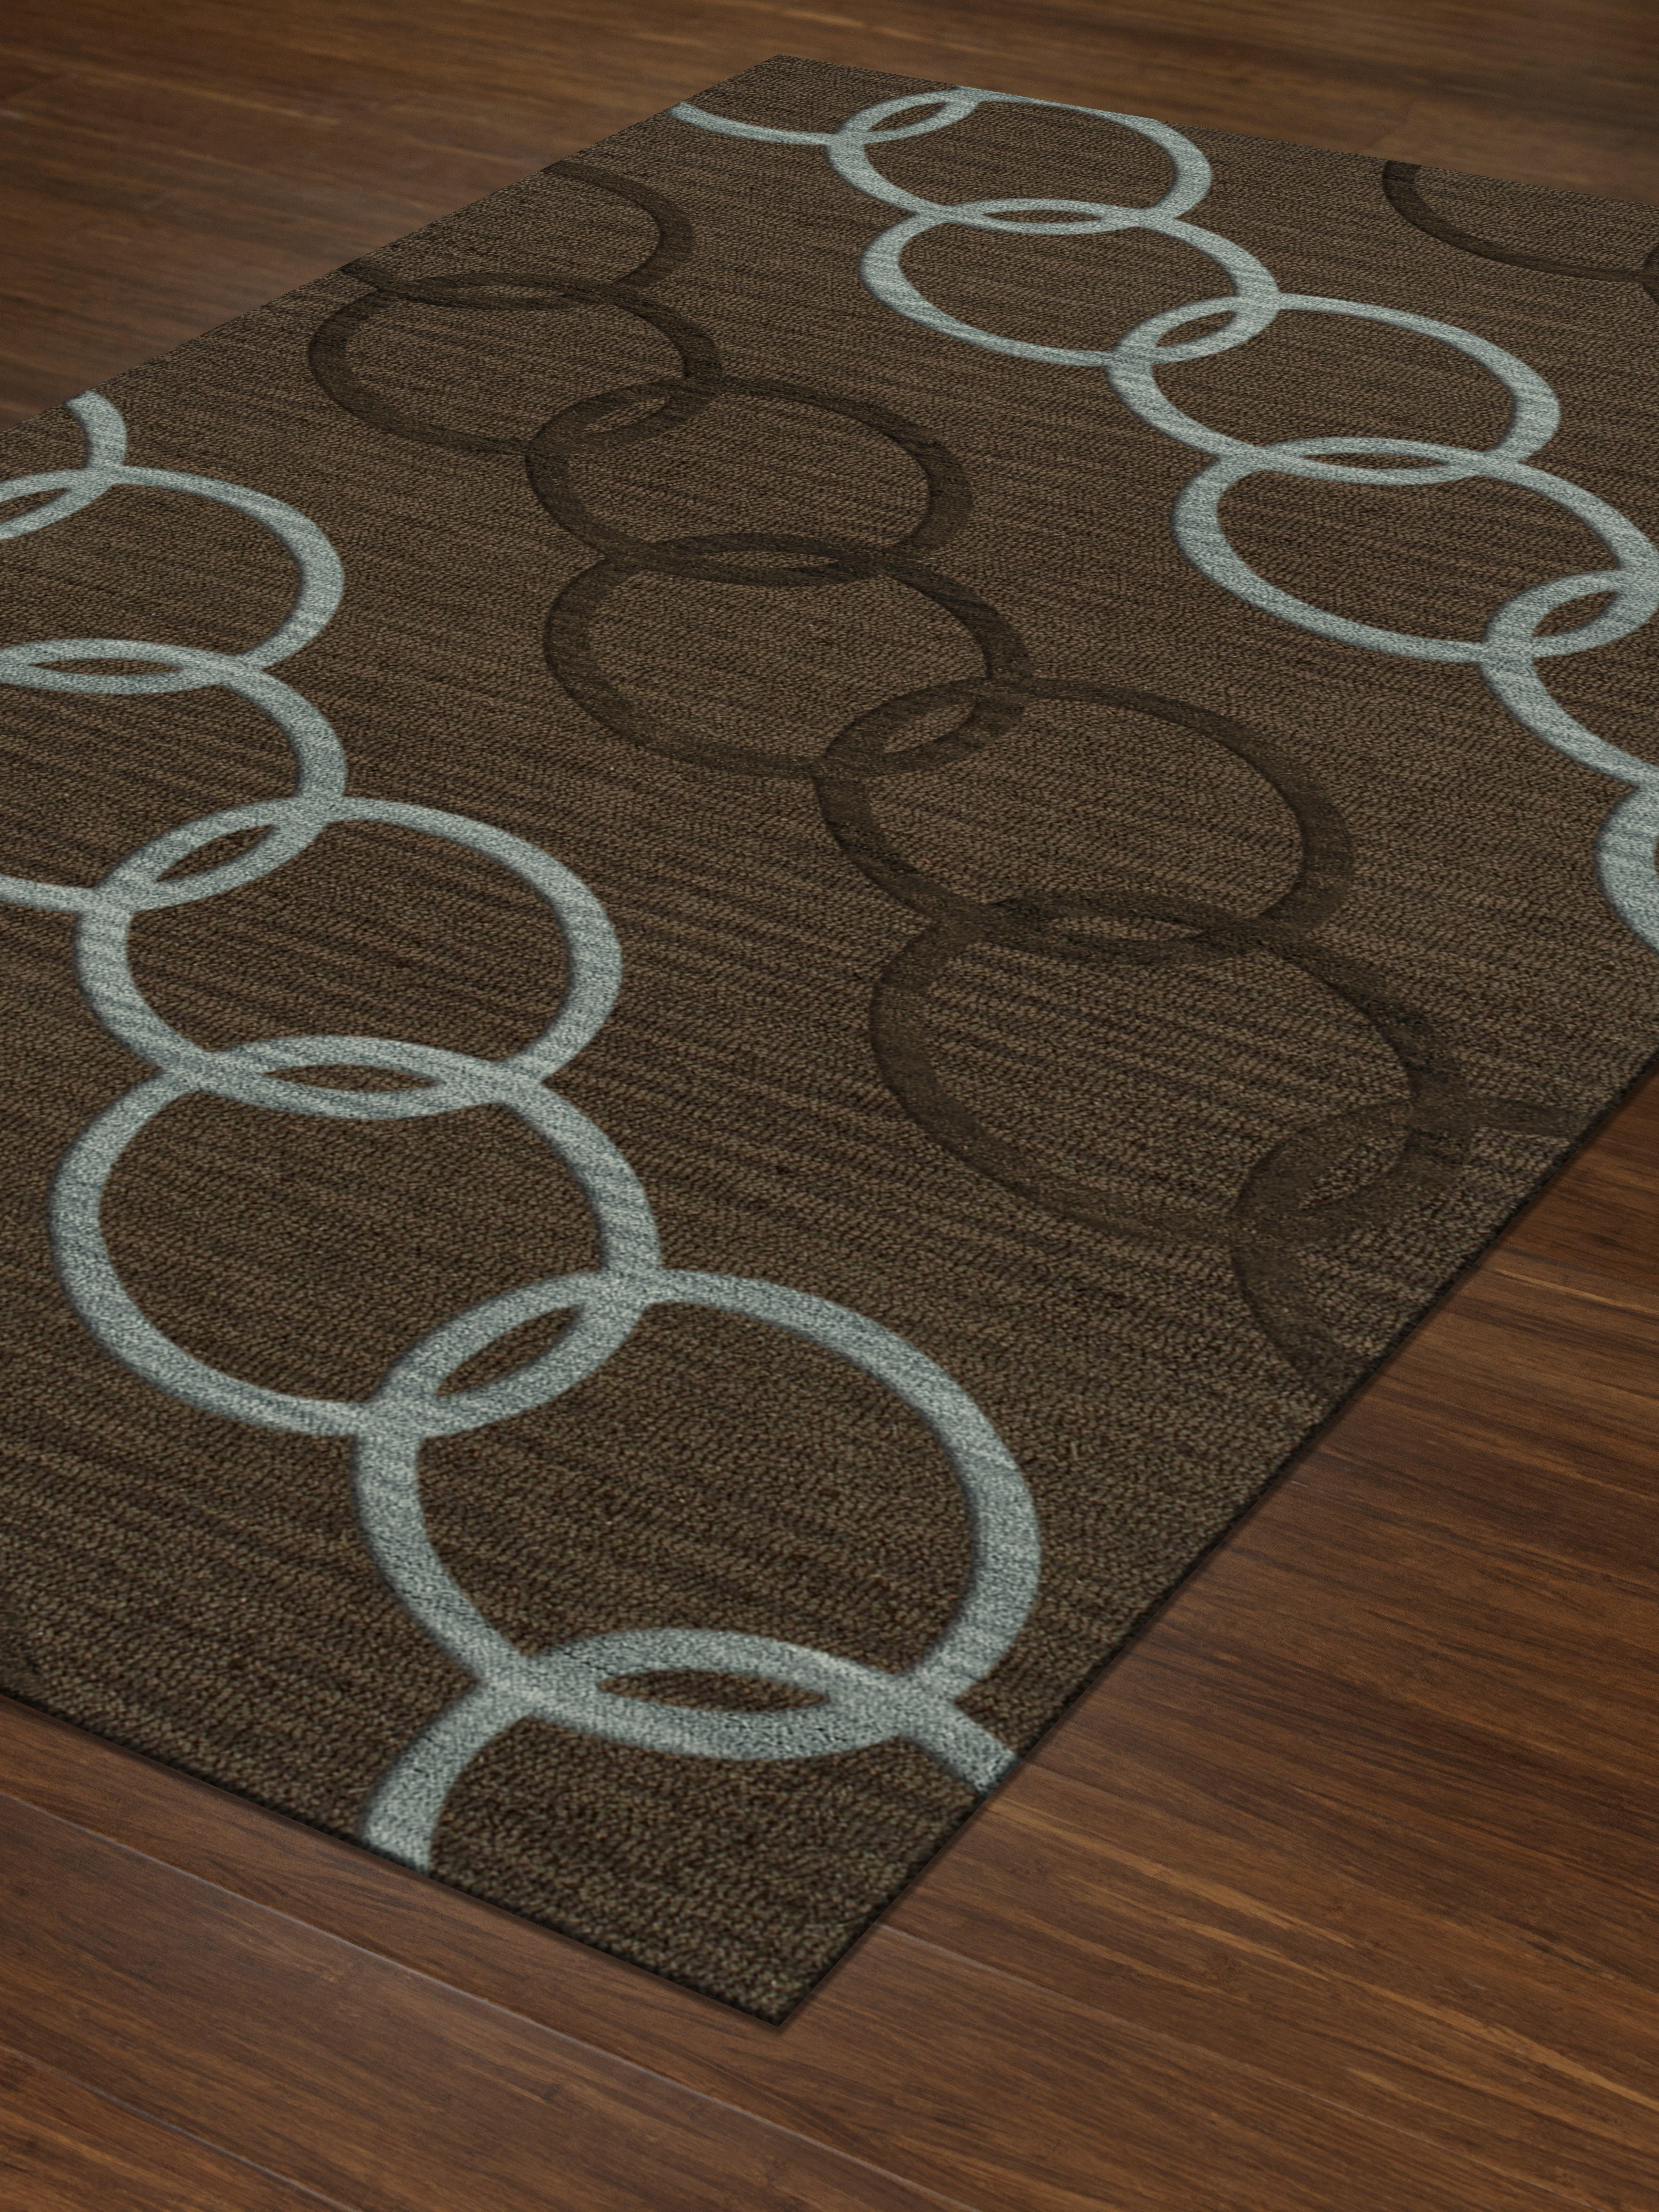 Latitude Run Garney Machine Woven Wool Brown Area Rug Wayfair